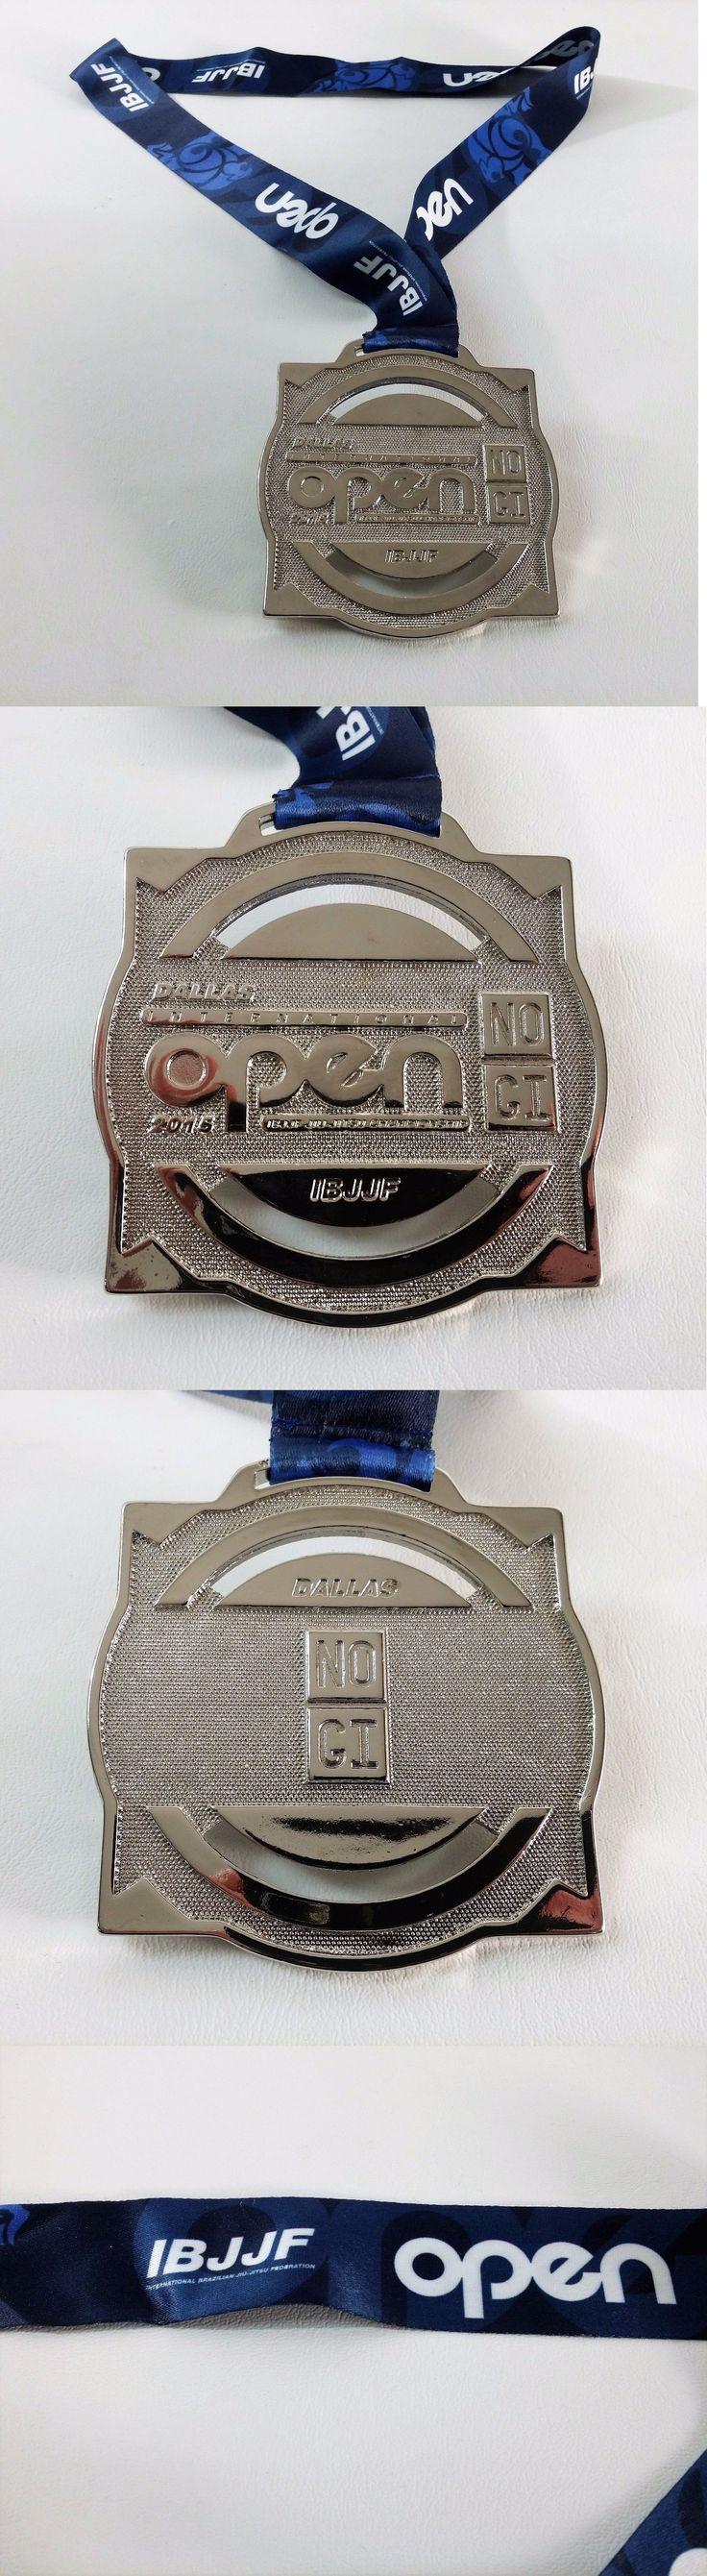 Other Combat Sport Supplies 16044: 2015 Dallas Tx Open Ibjjf Jiu-Jitsu Championship Silver Medal Trophy No Gi Award -> BUY IT NOW ONLY: $44.95 on eBay!